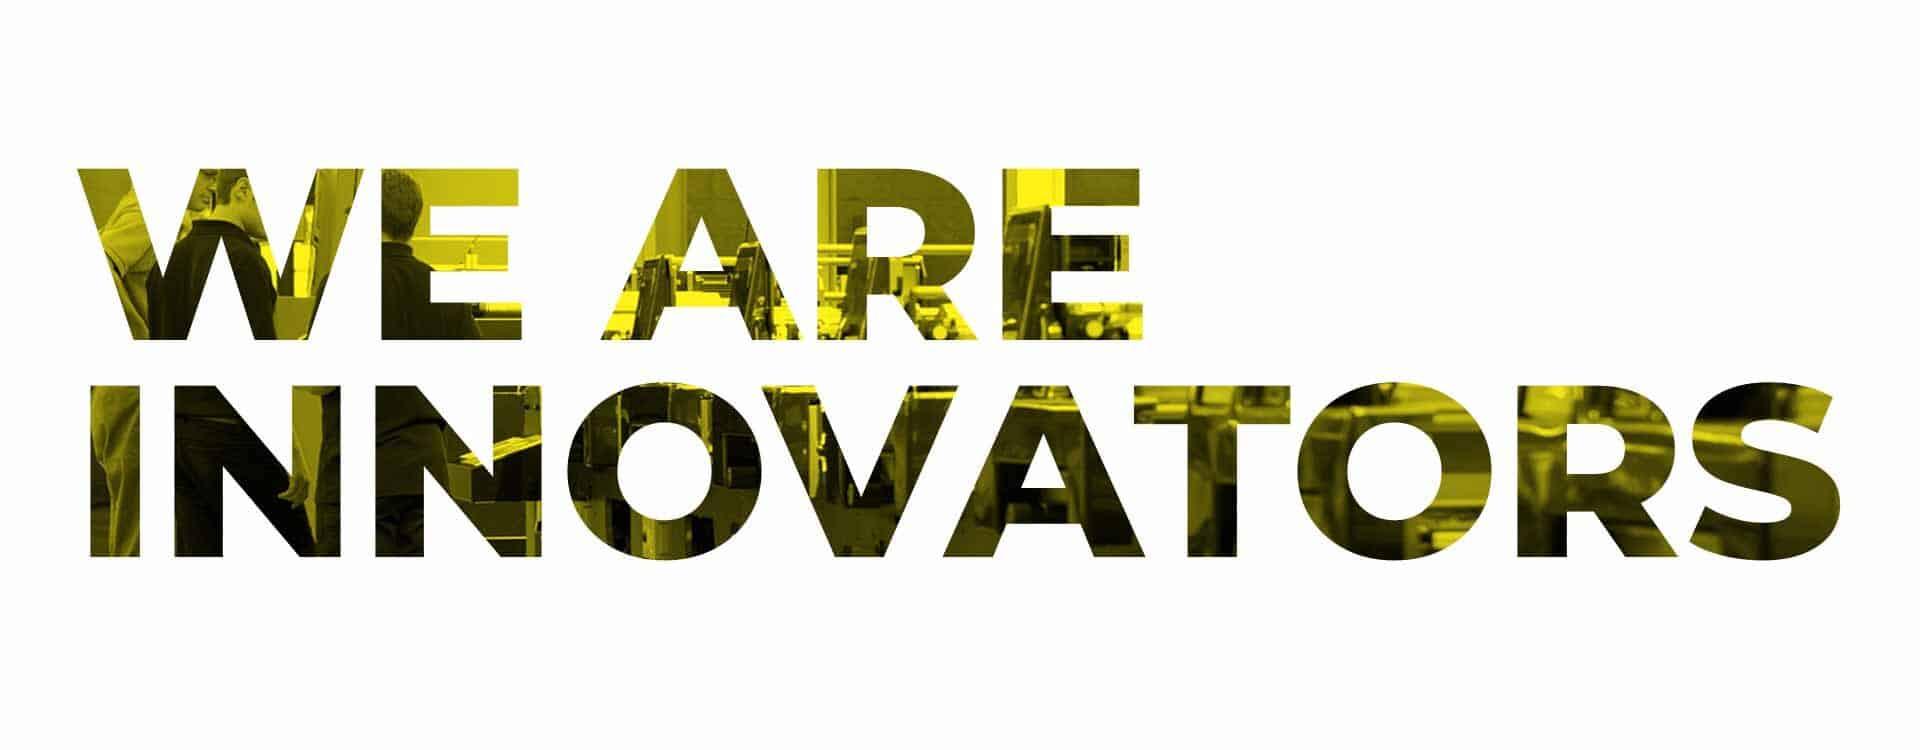 We are innovators